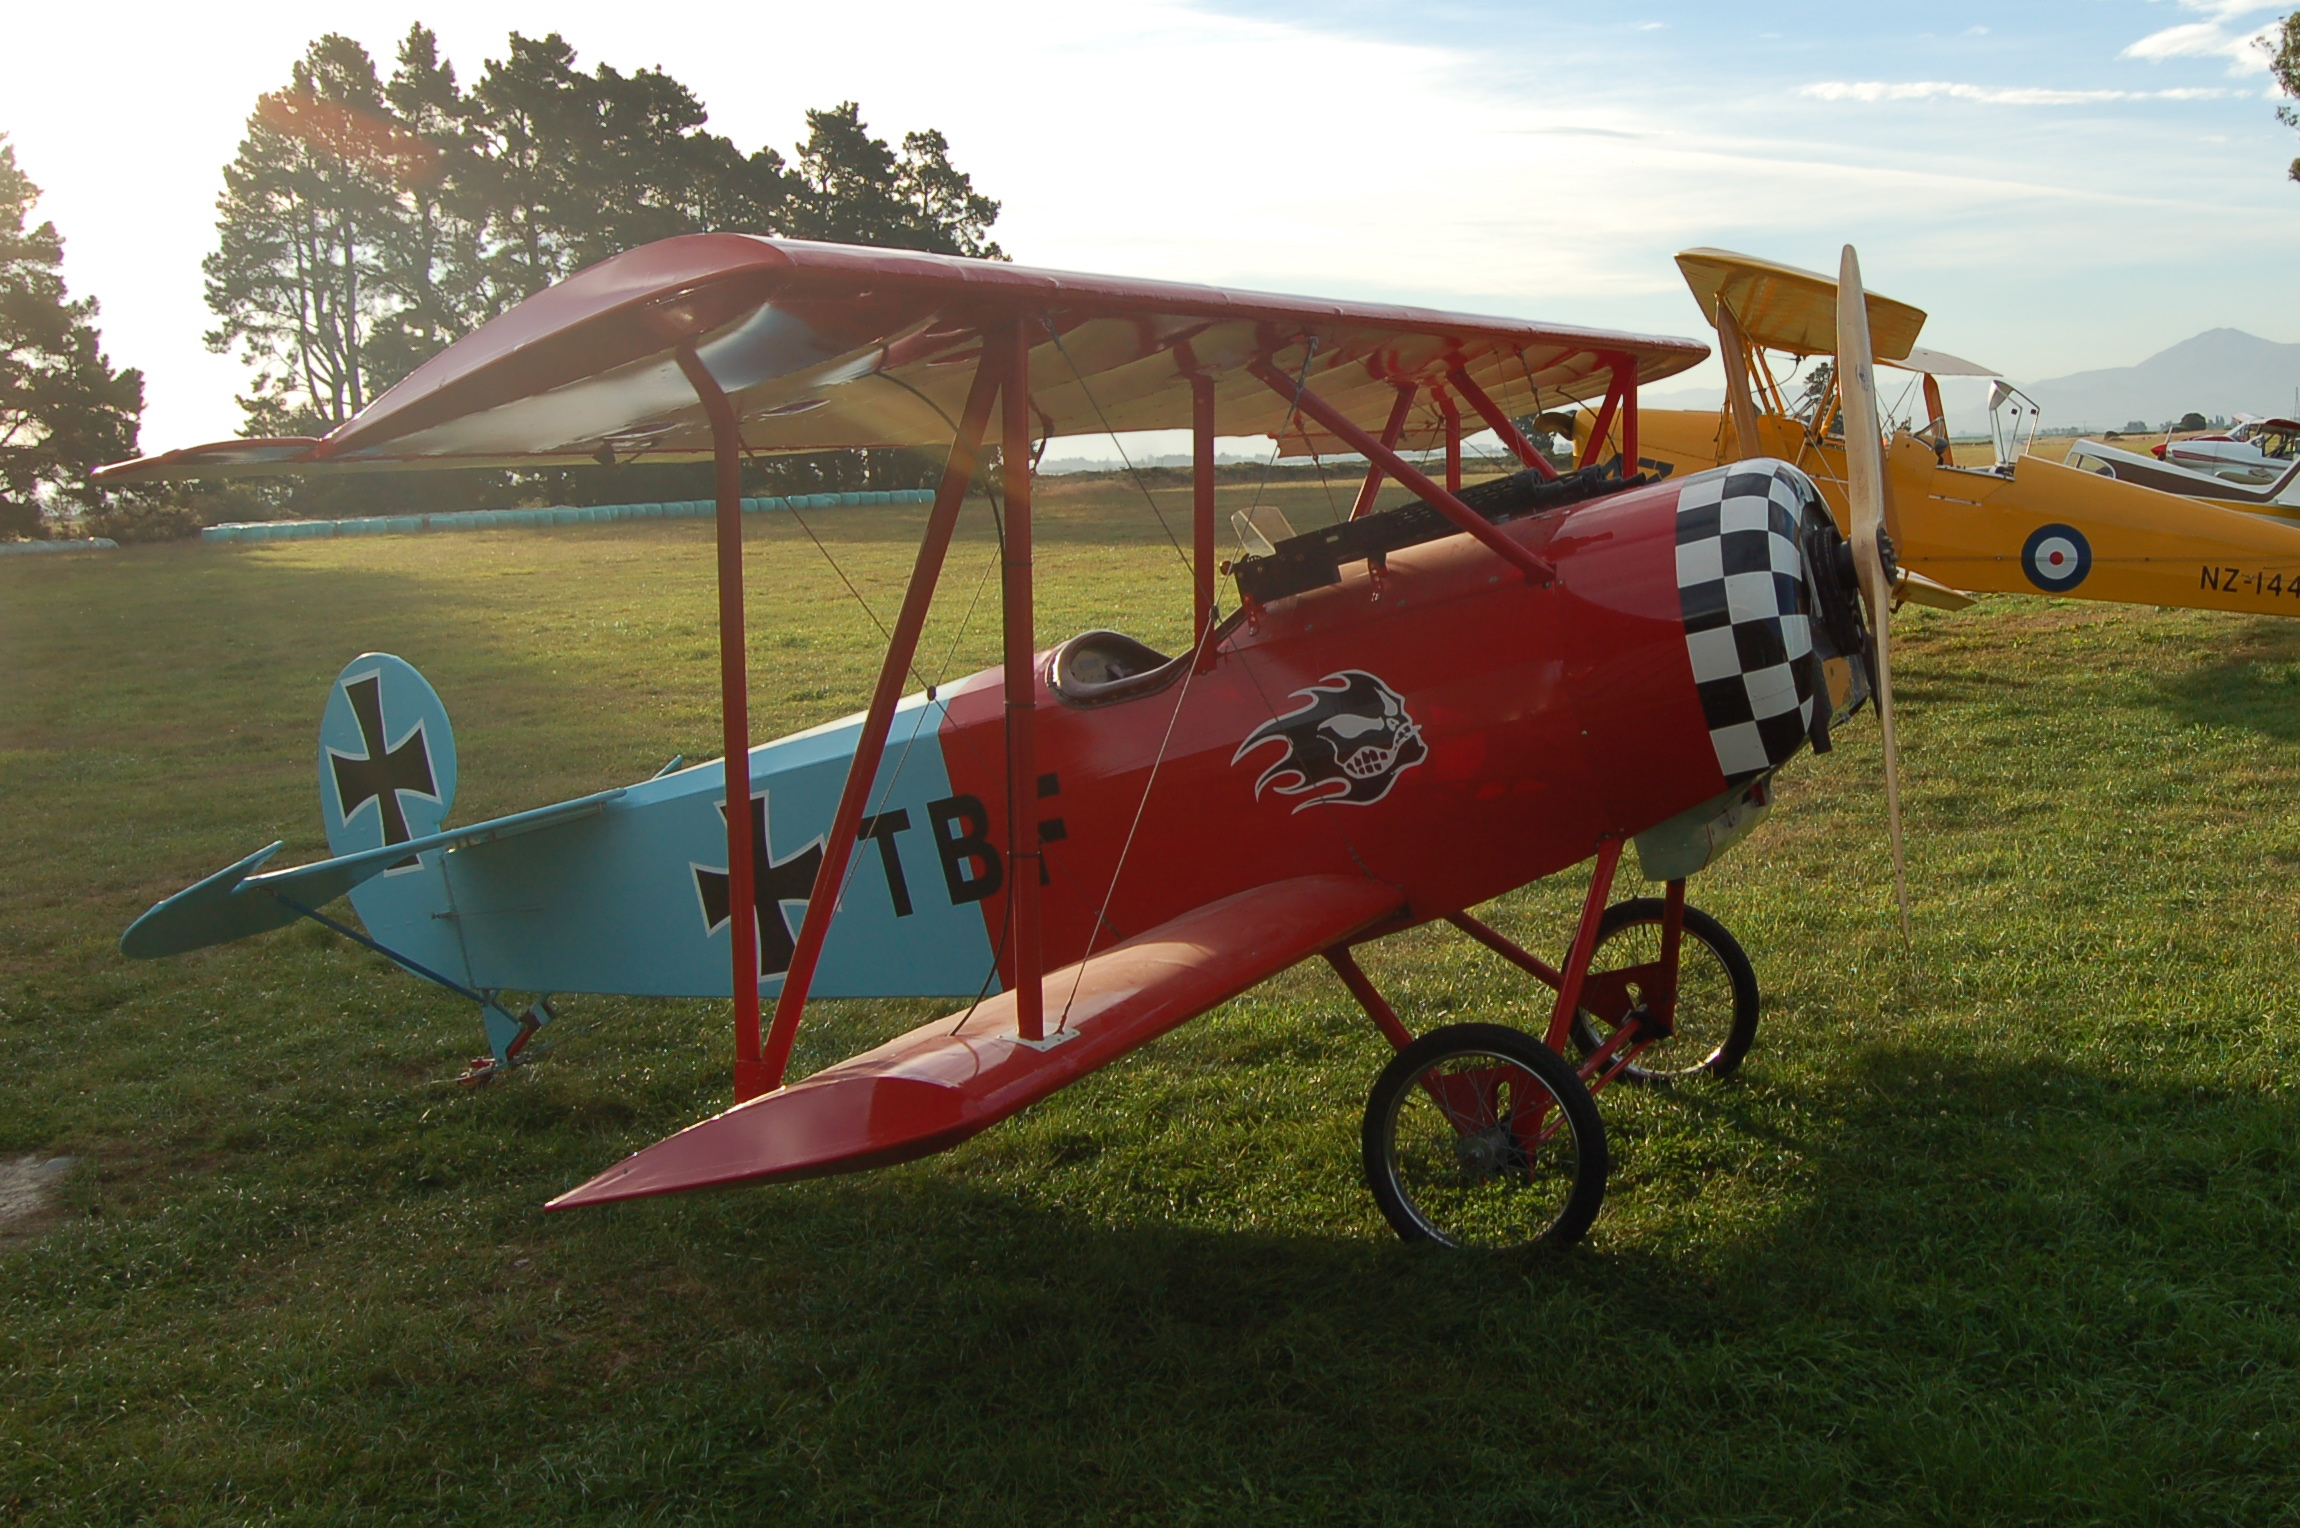 Localy Based Aerodrome Fokker D.VI